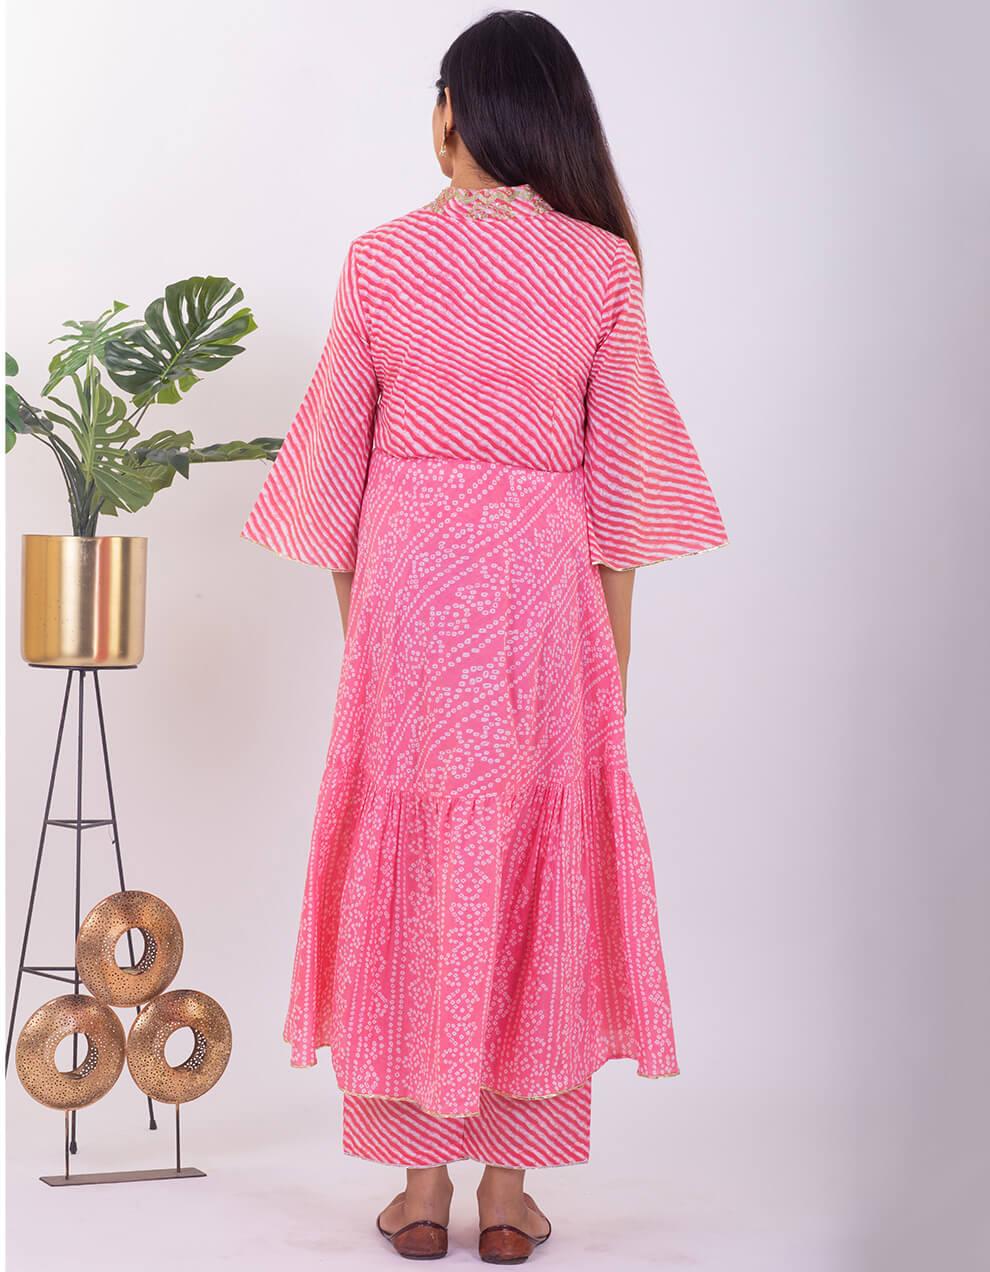 Light Pink hand embroidered tiered bandhani cotton kurta with pallazzo and dupatta - Set of 3